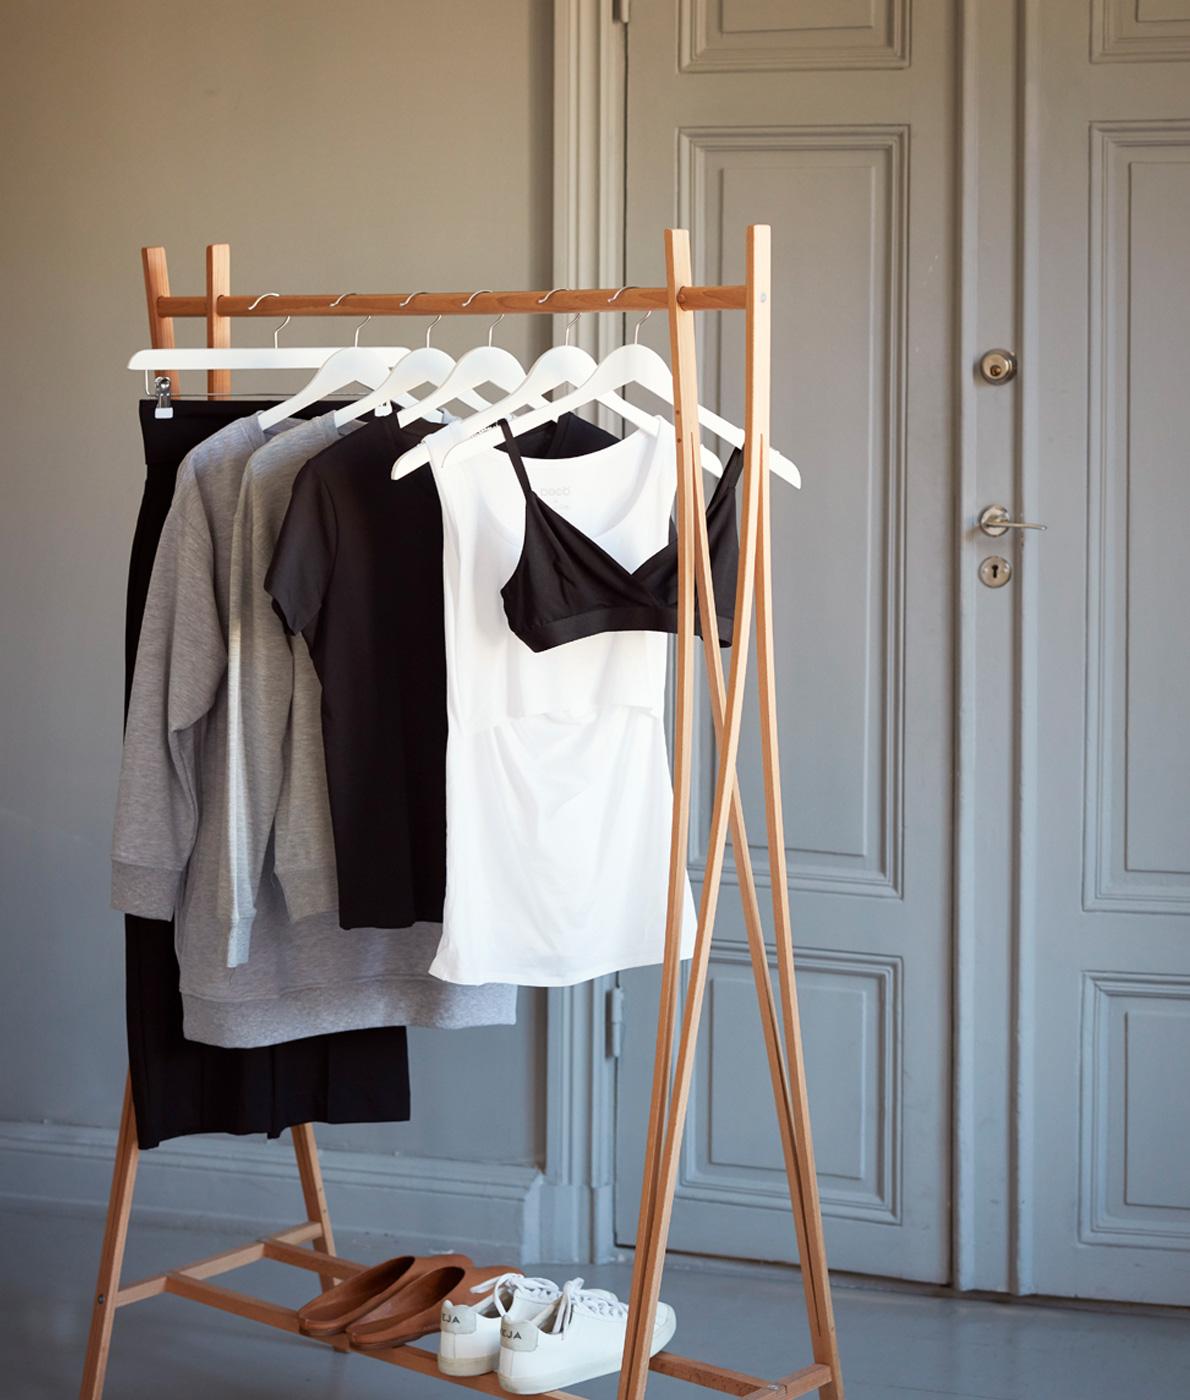 Long live your clothes